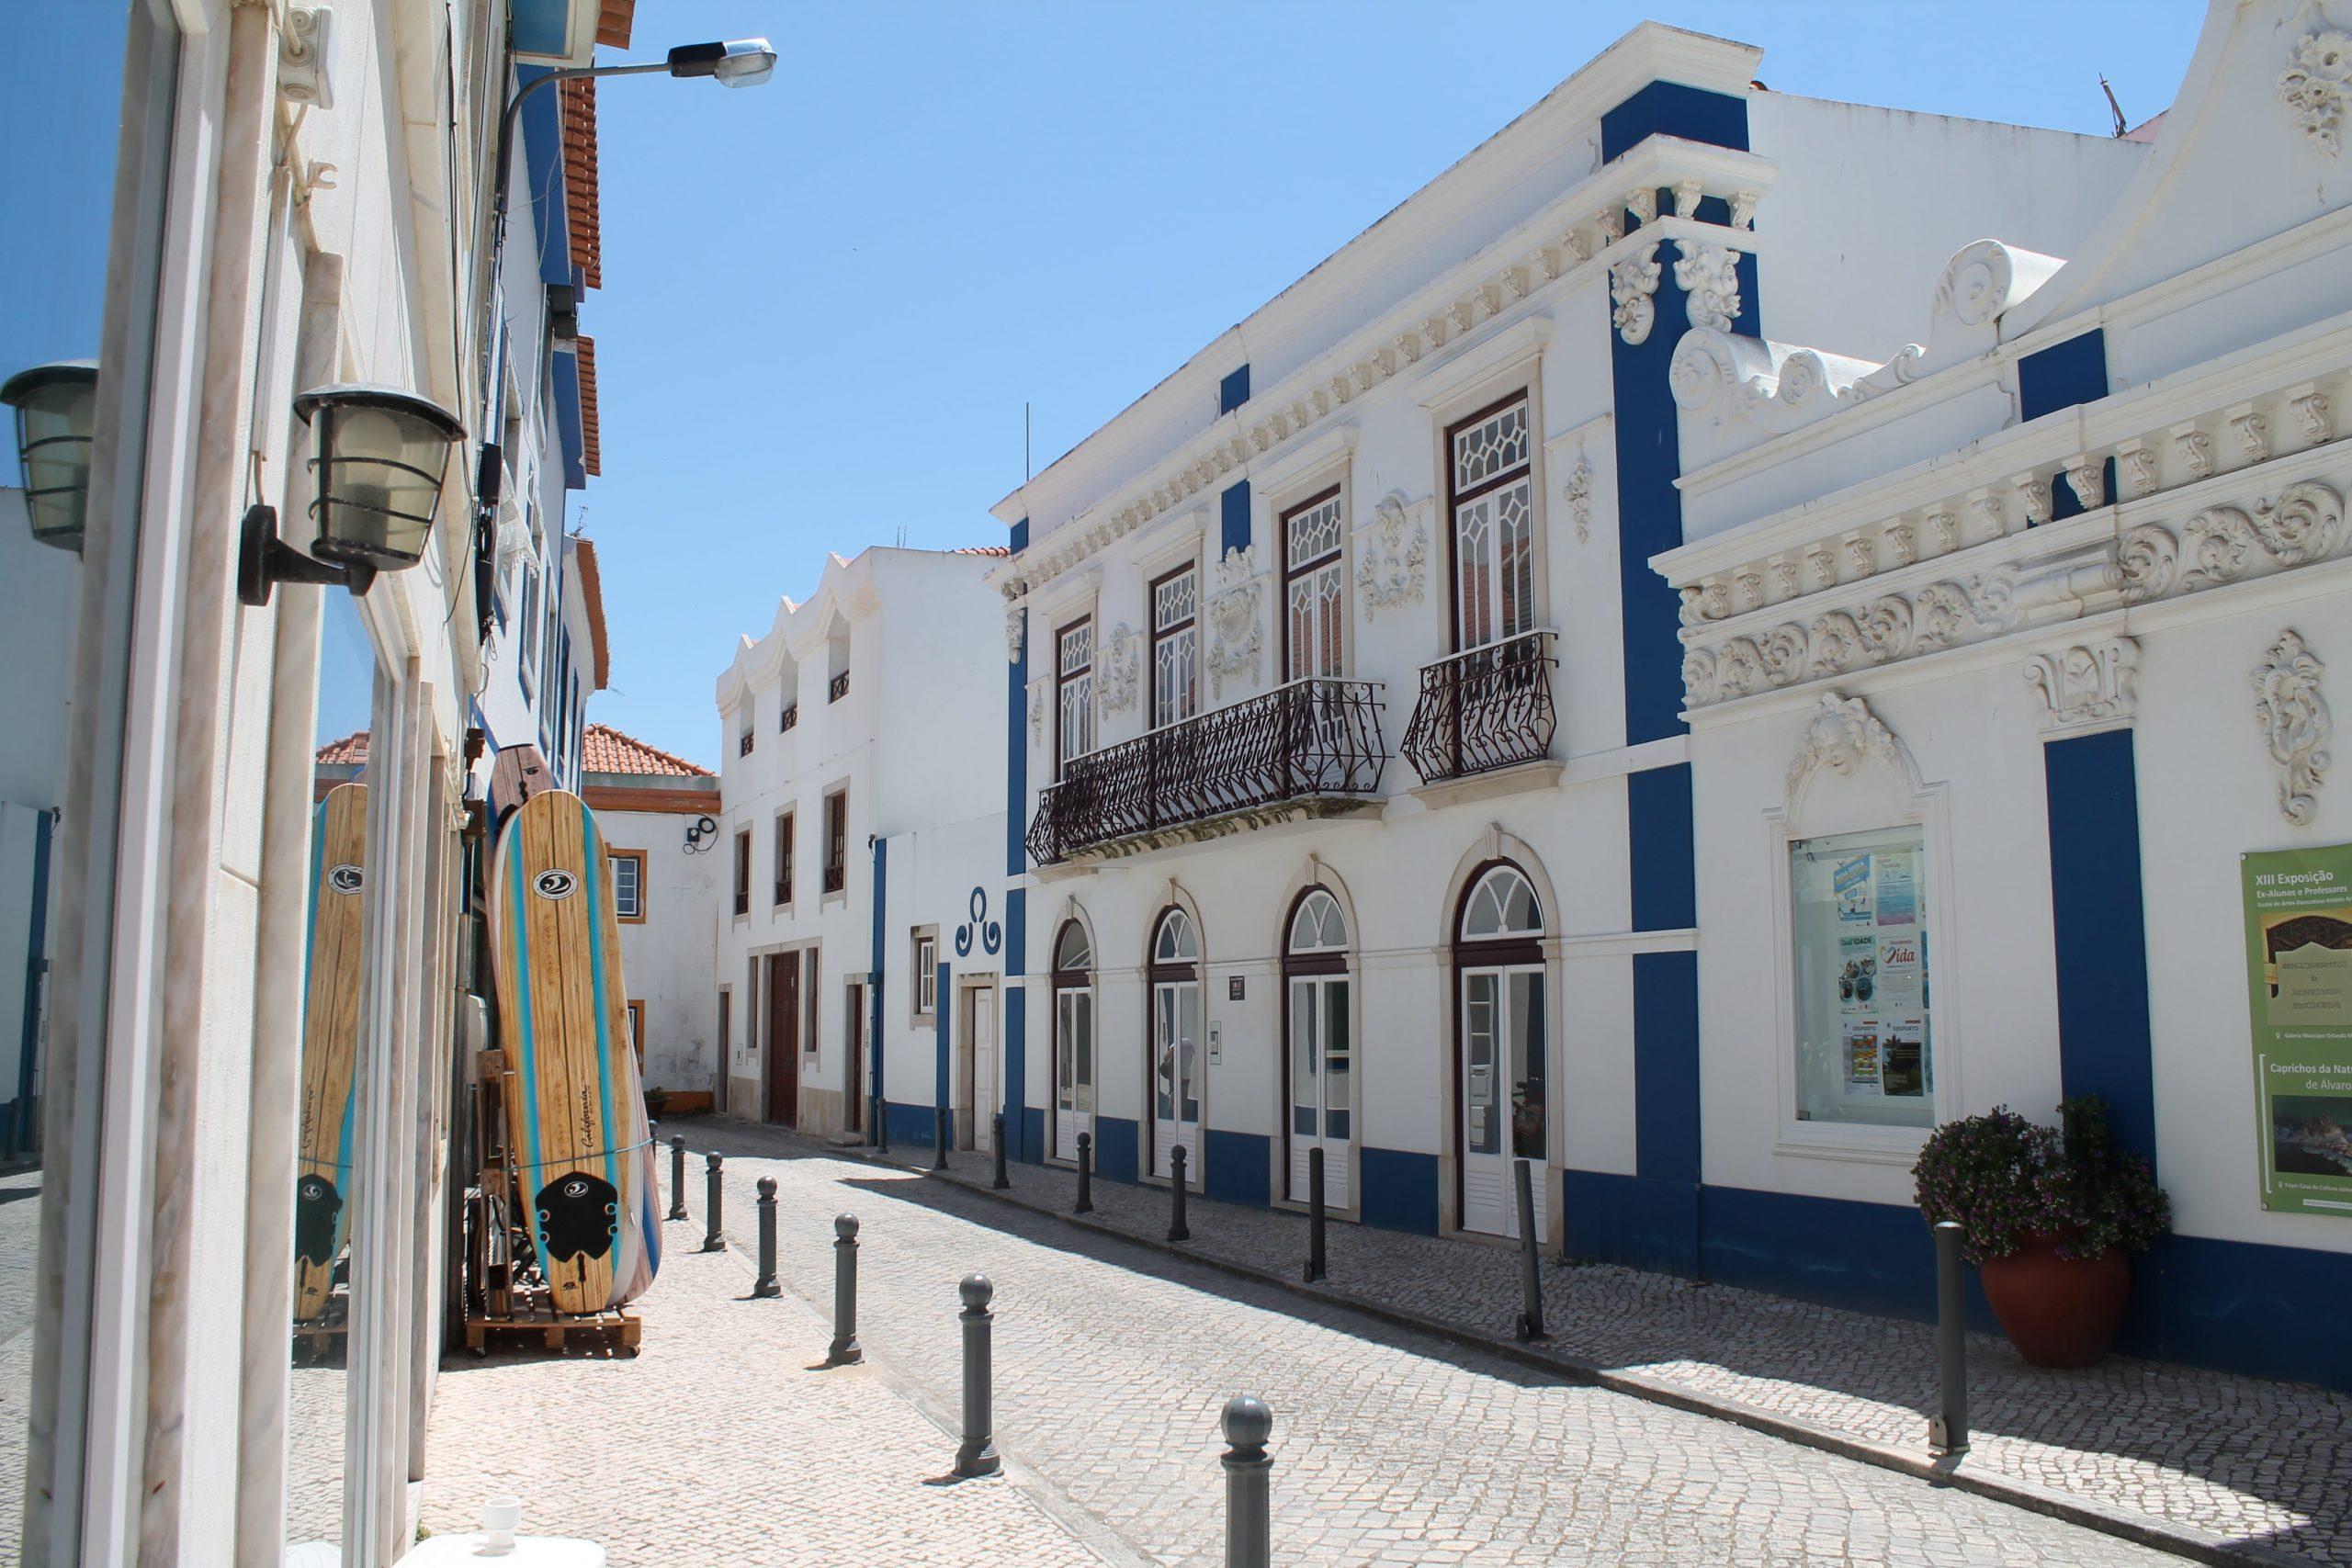 Casa de Cultura Jaime Lobo Ericeira